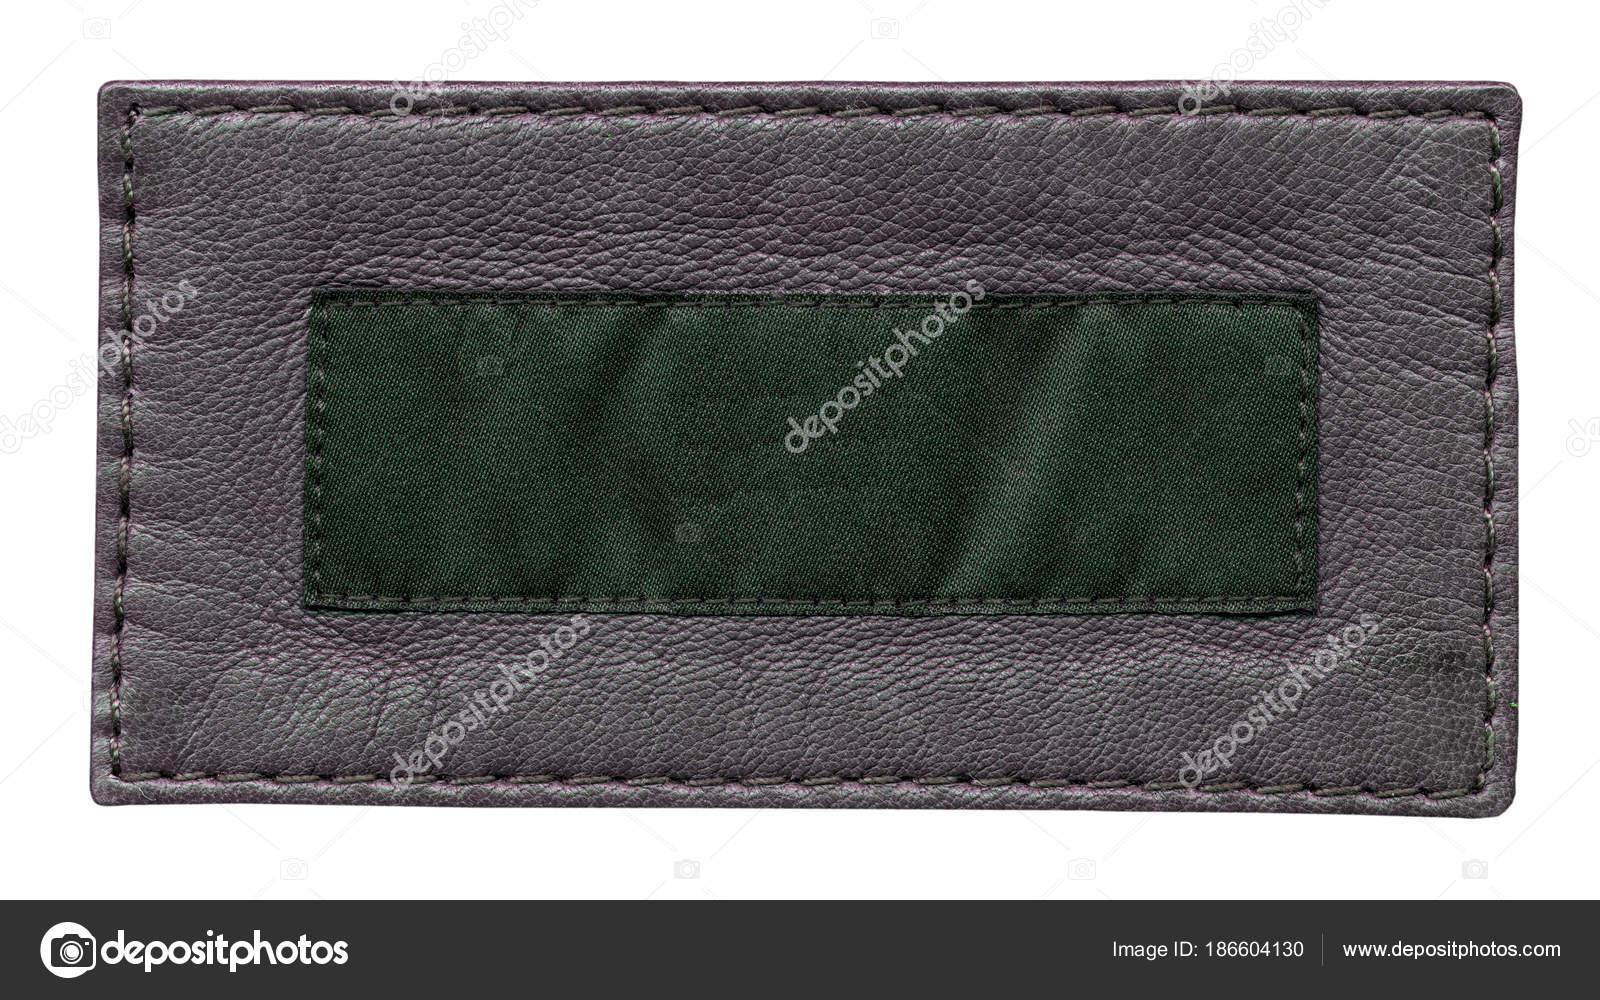 f9d39eccca Κενό γκρι δέρμα και πράσινα κλωστοϋφαντουργικών ετικέτα απομονωθεί σε  λευκό– εικόνα αρχείου